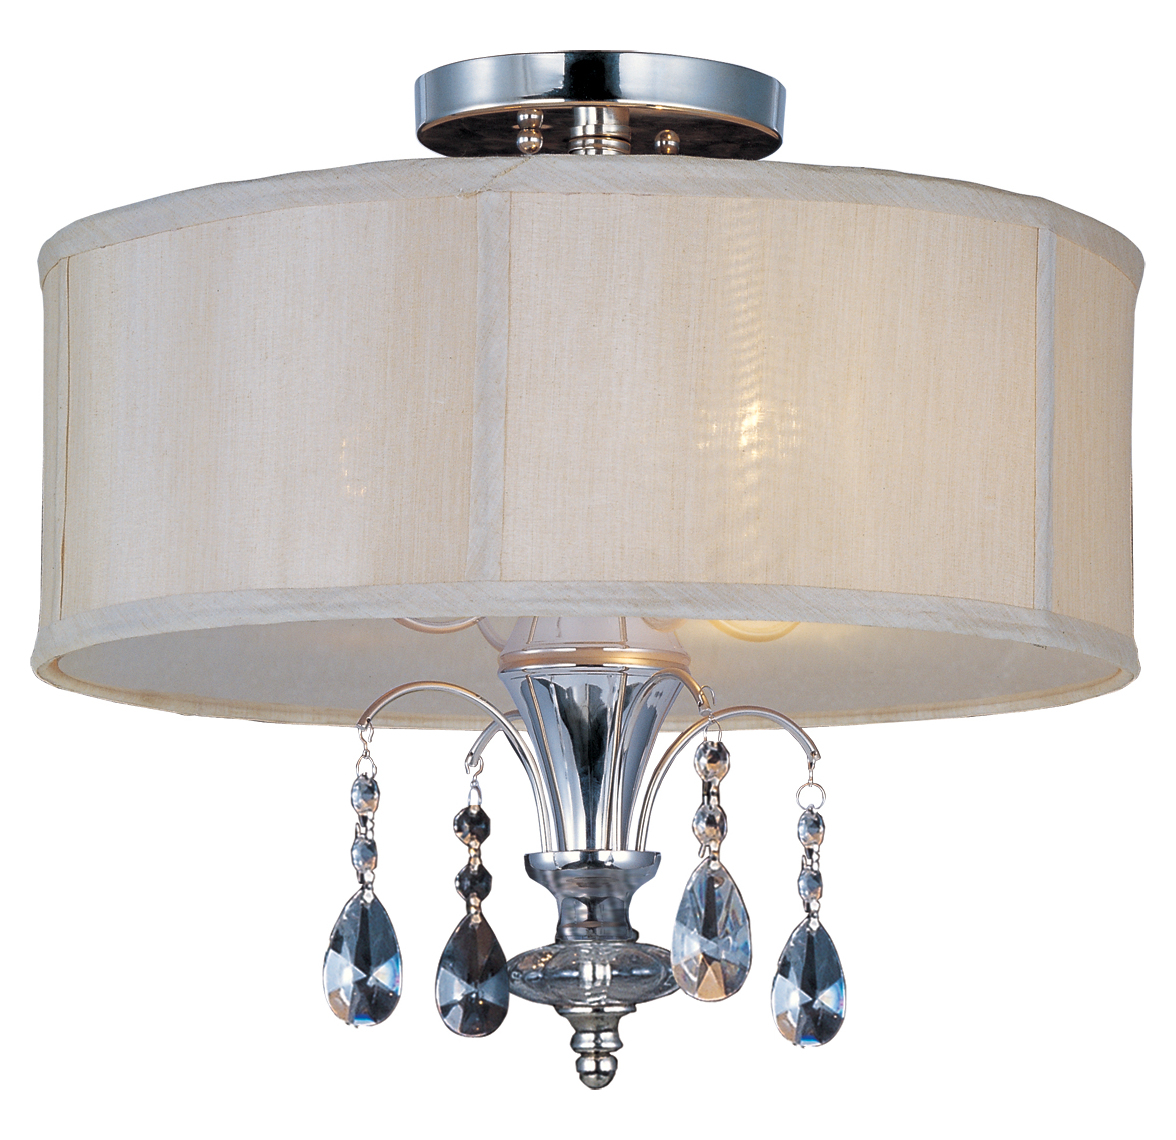 Maxim Three Light Clear Glass Polished Nickel Drum Shade